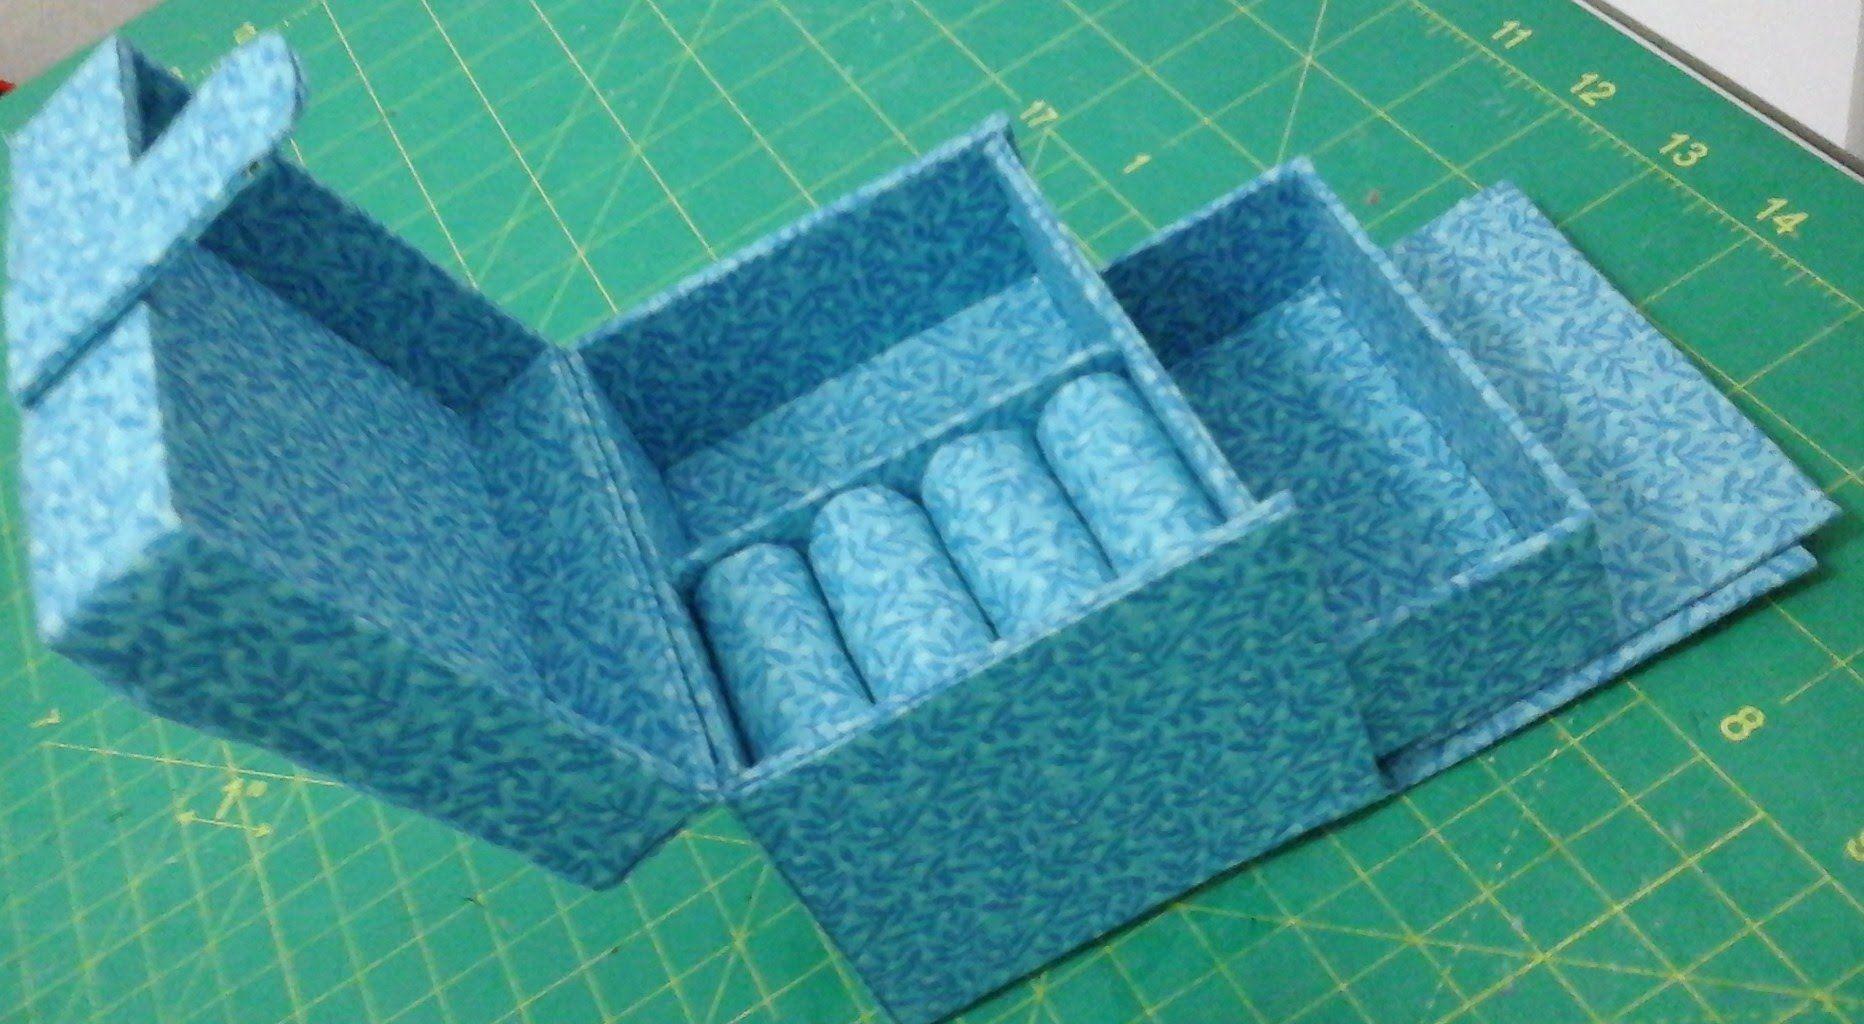 como fazer um mine porta joias manualidades echas con carton pinterest cartonaje cajas y. Black Bedroom Furniture Sets. Home Design Ideas